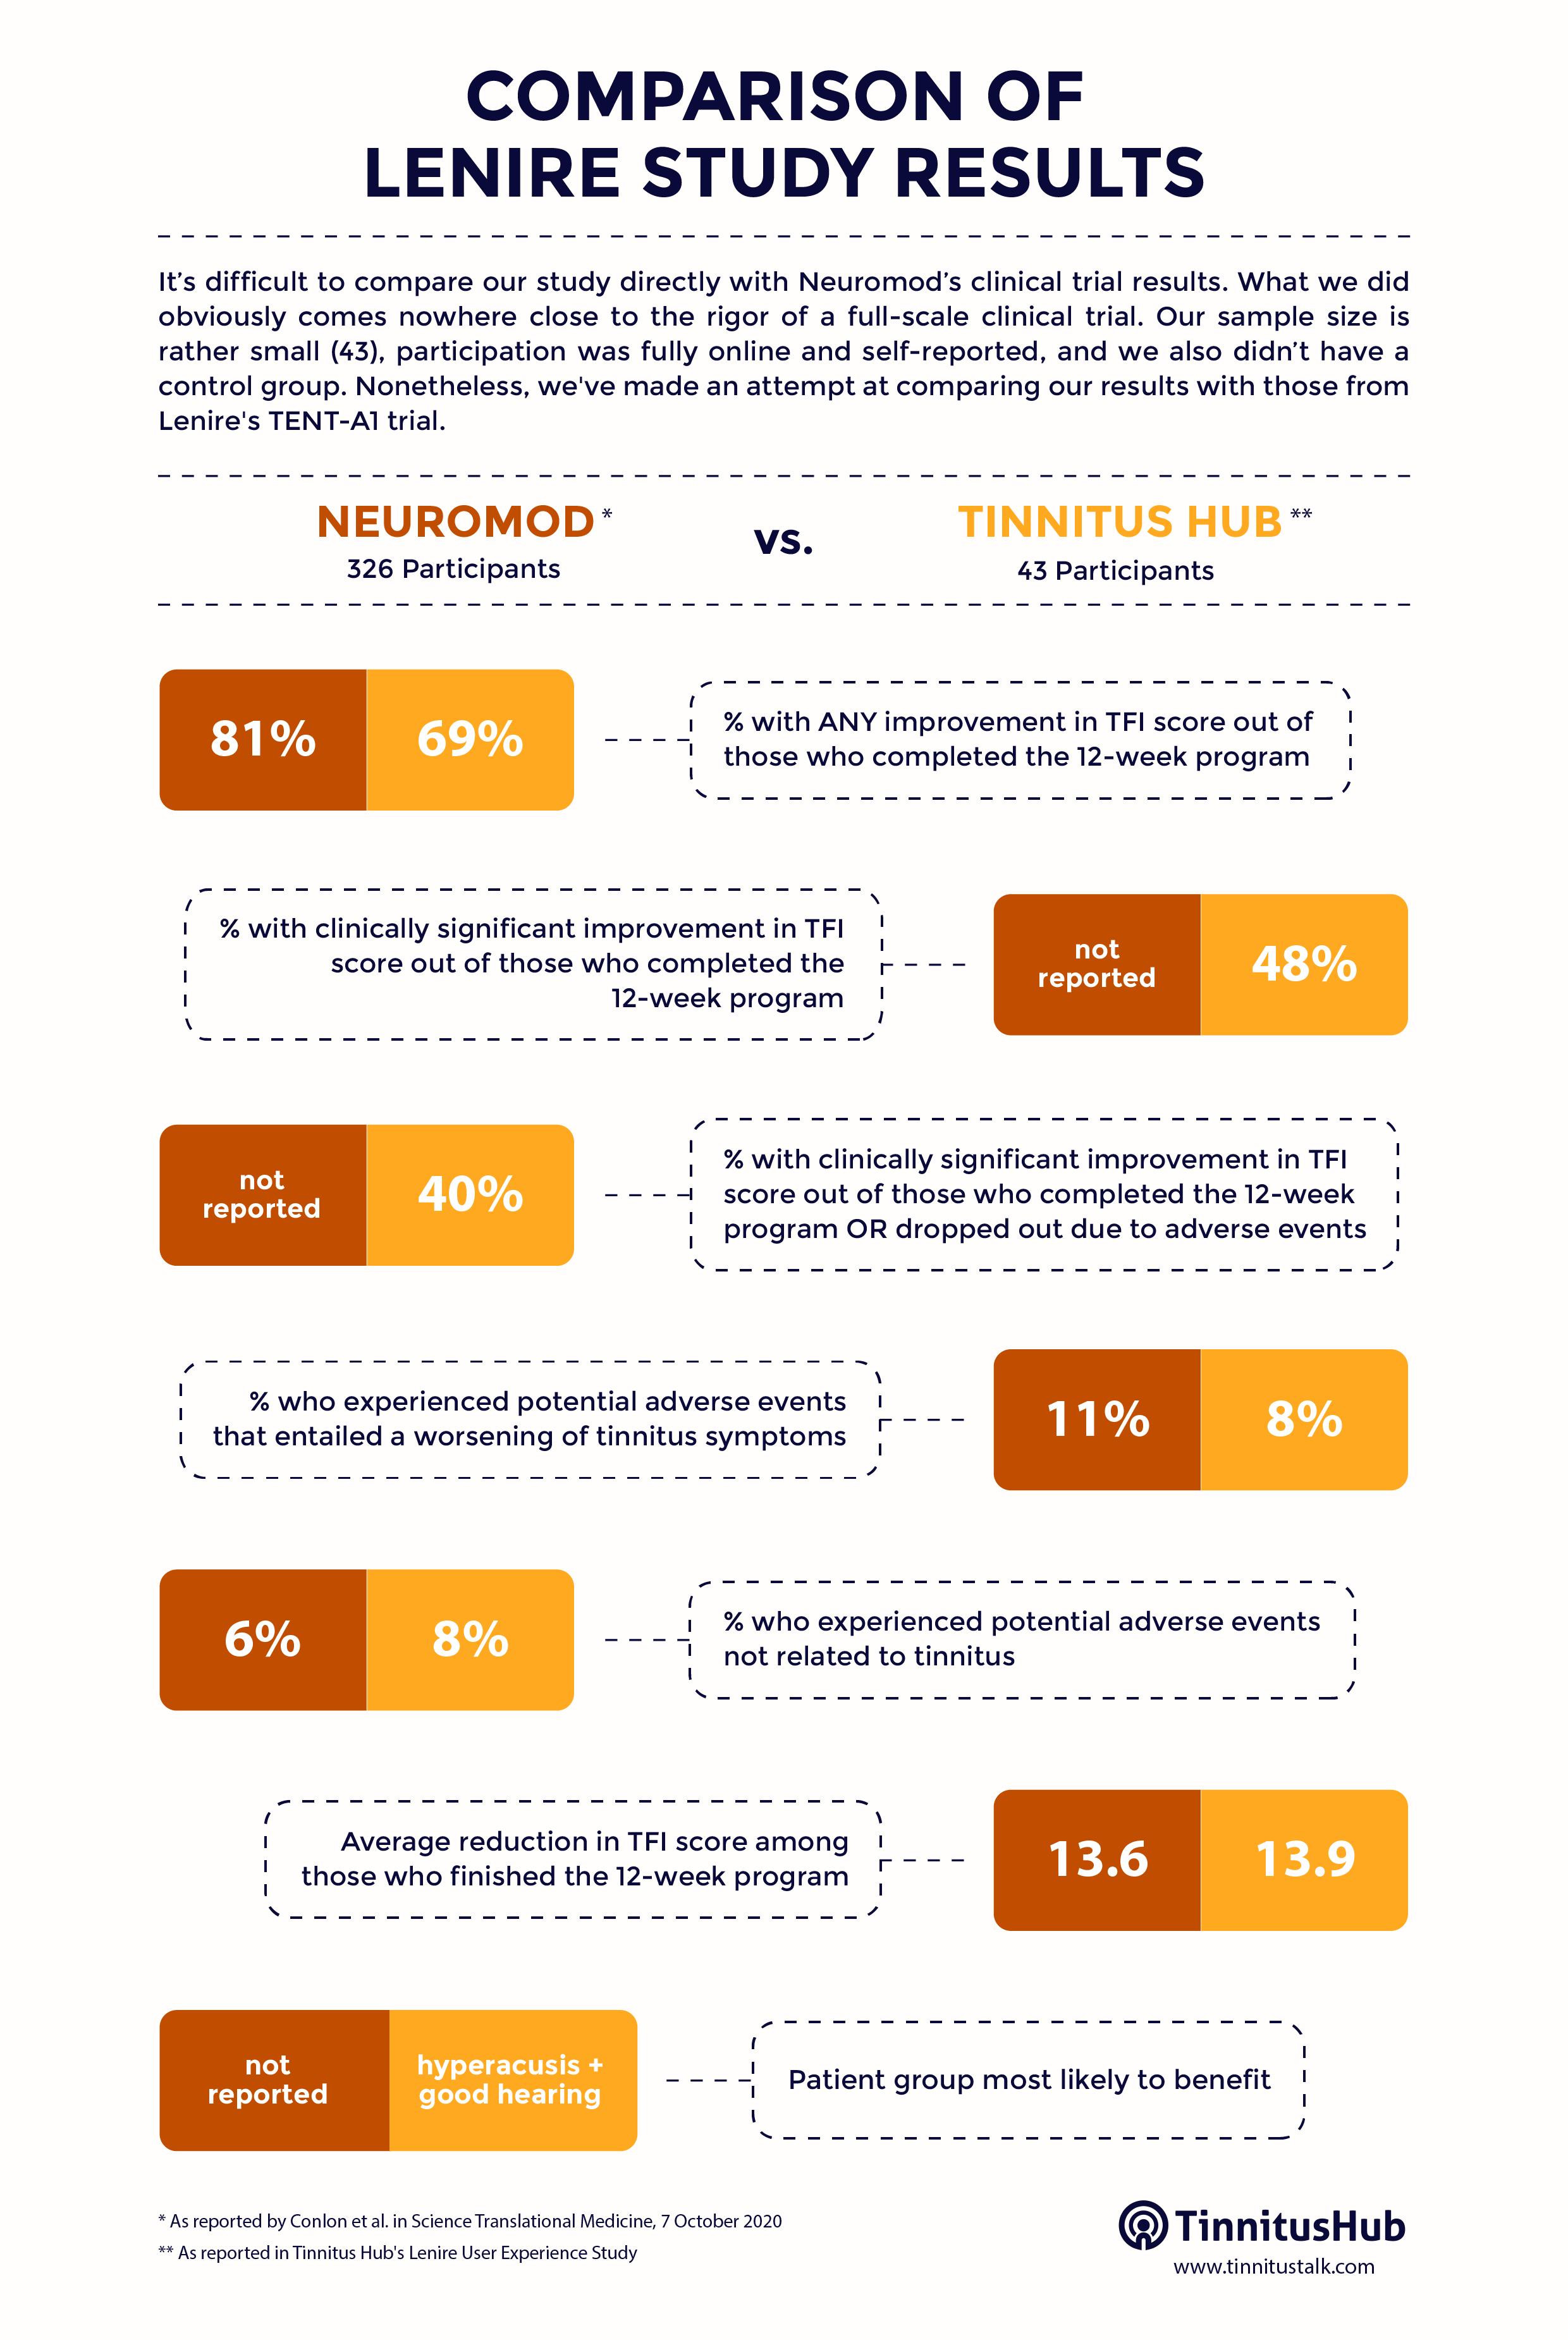 Comparison of Lenire Study Results